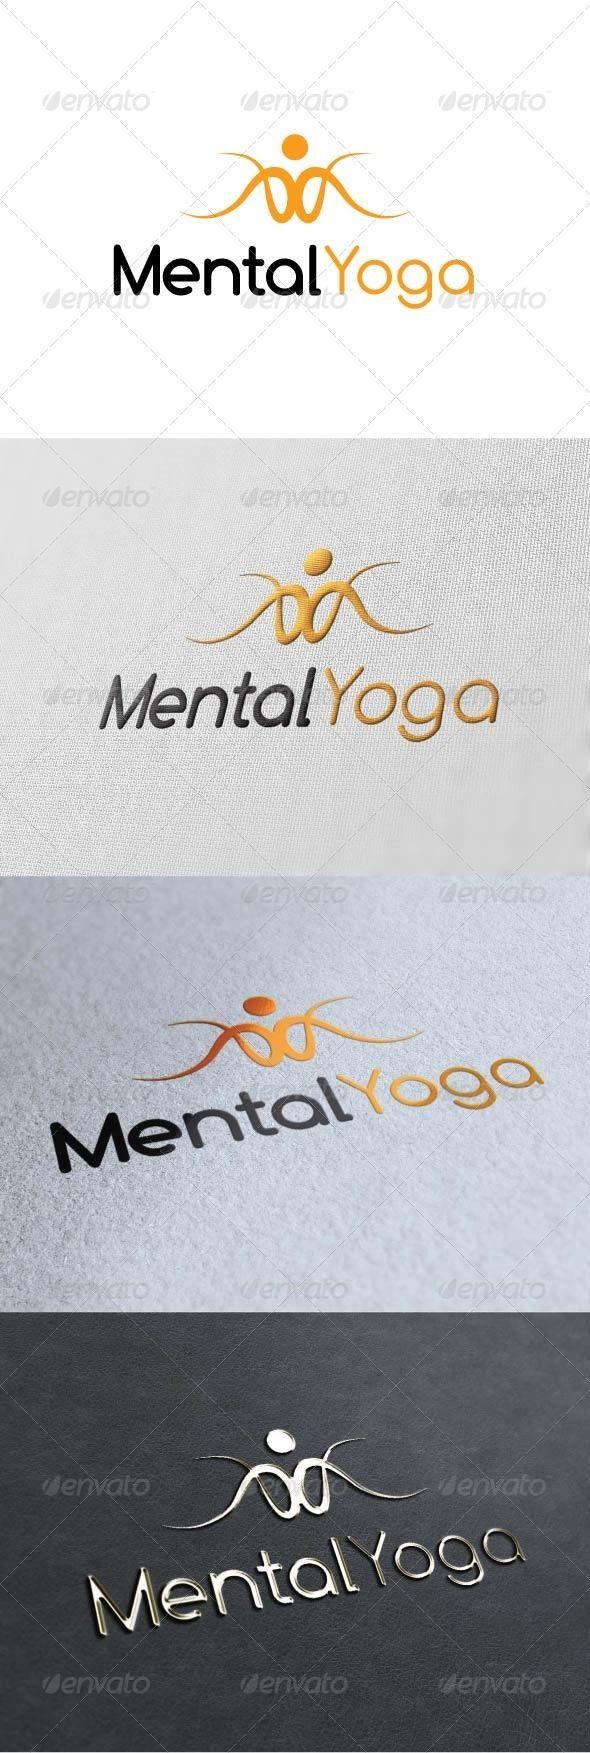 Mental Yoga Logo Template GraphicRiver Re sizable Vector